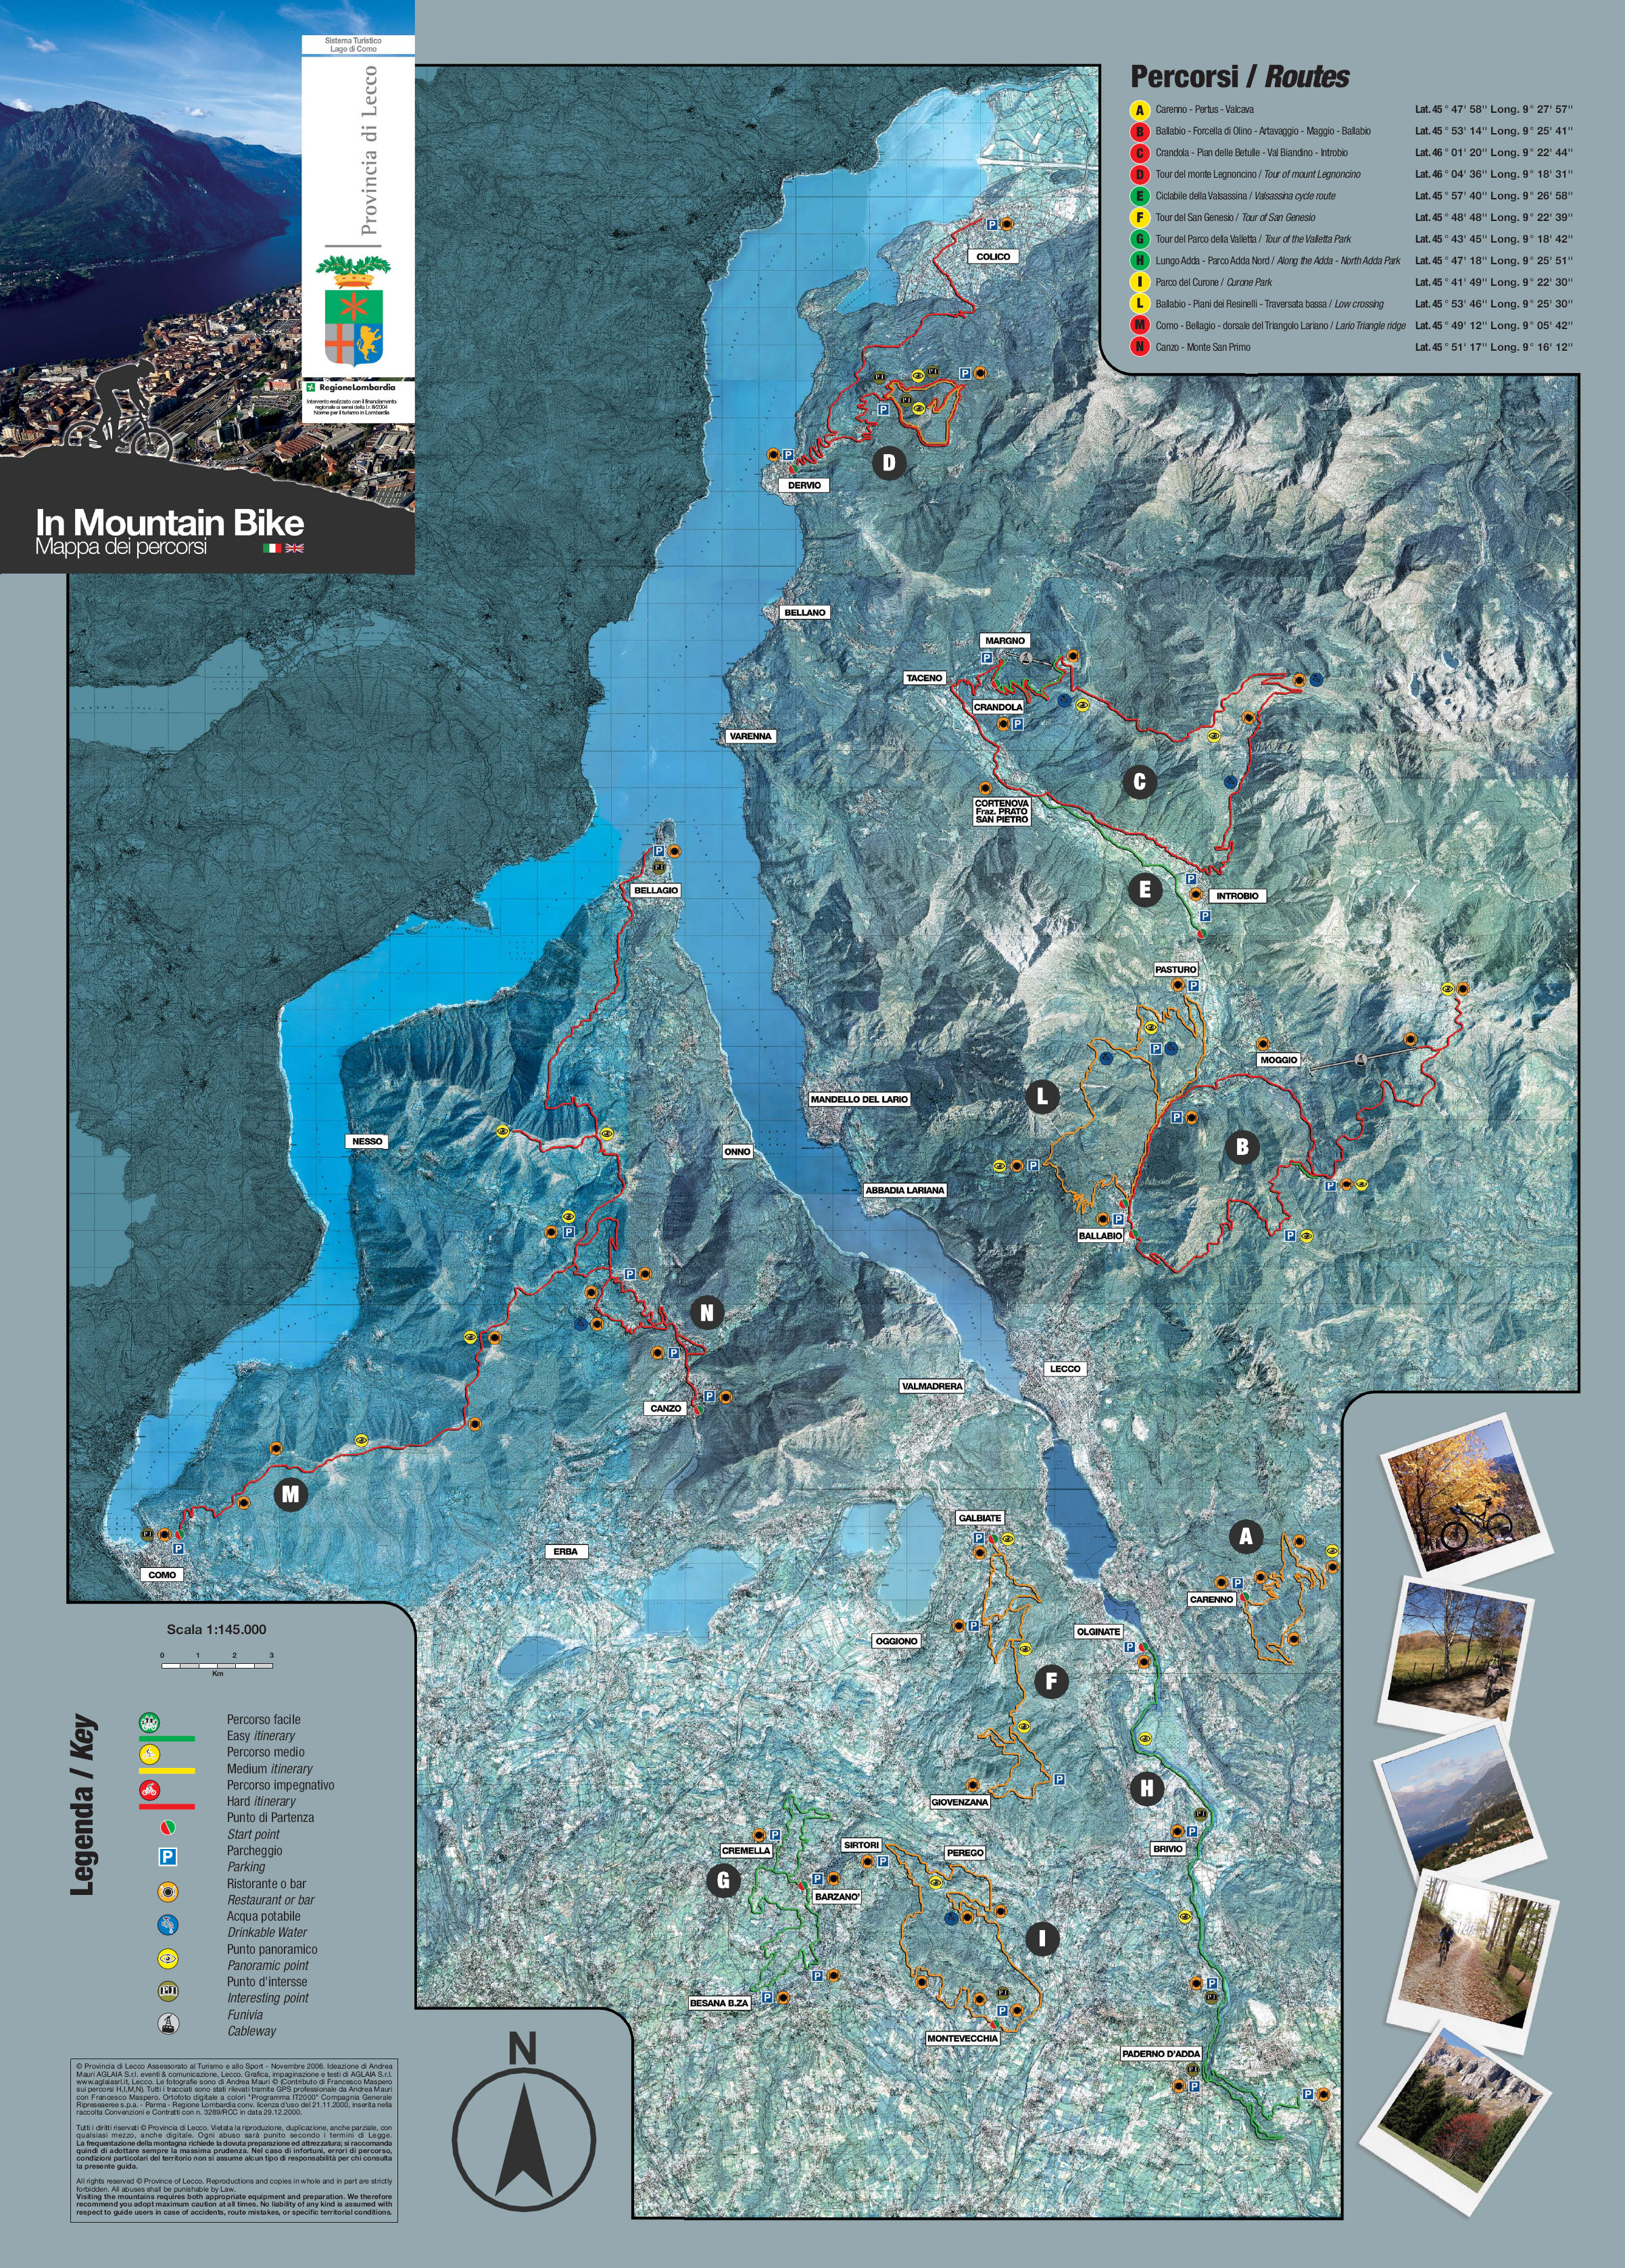 kart over gardasjøen Comosjøen eller Gardasjøen | | [terrengsykkel.no] Arena kart over gardasjøen